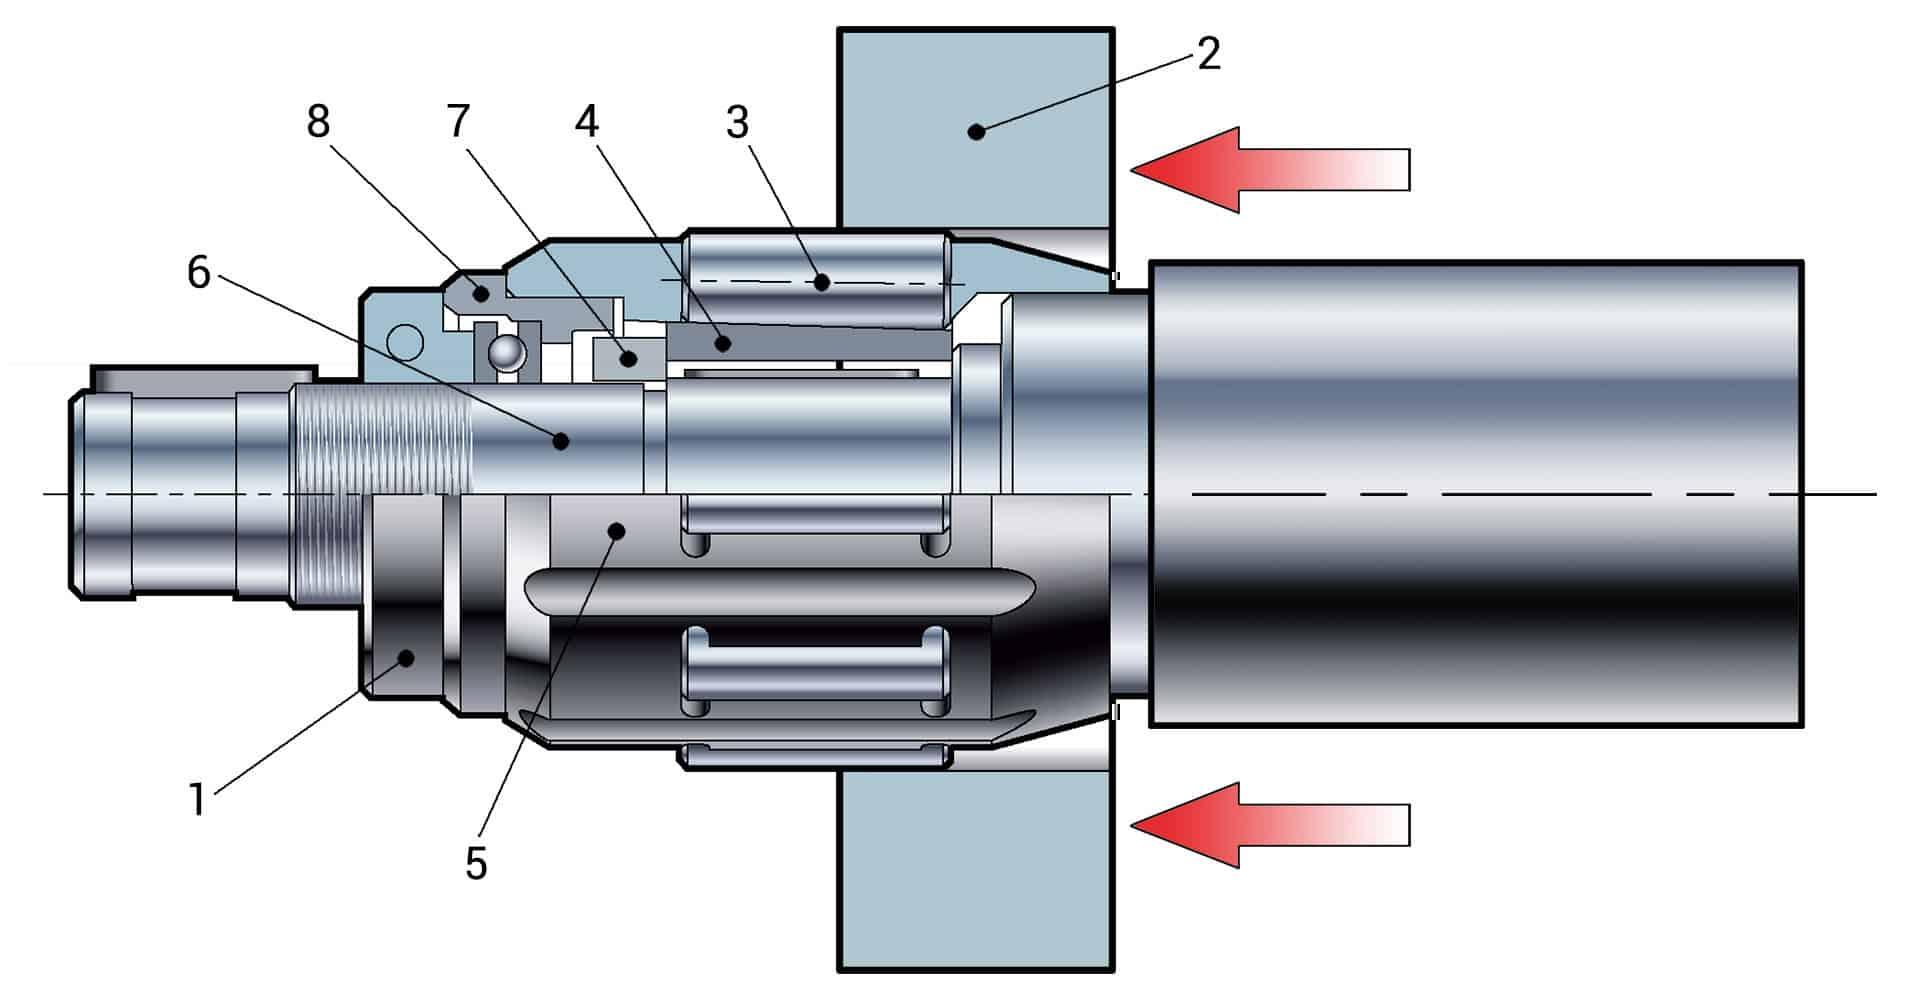 skive burnishing tool settings